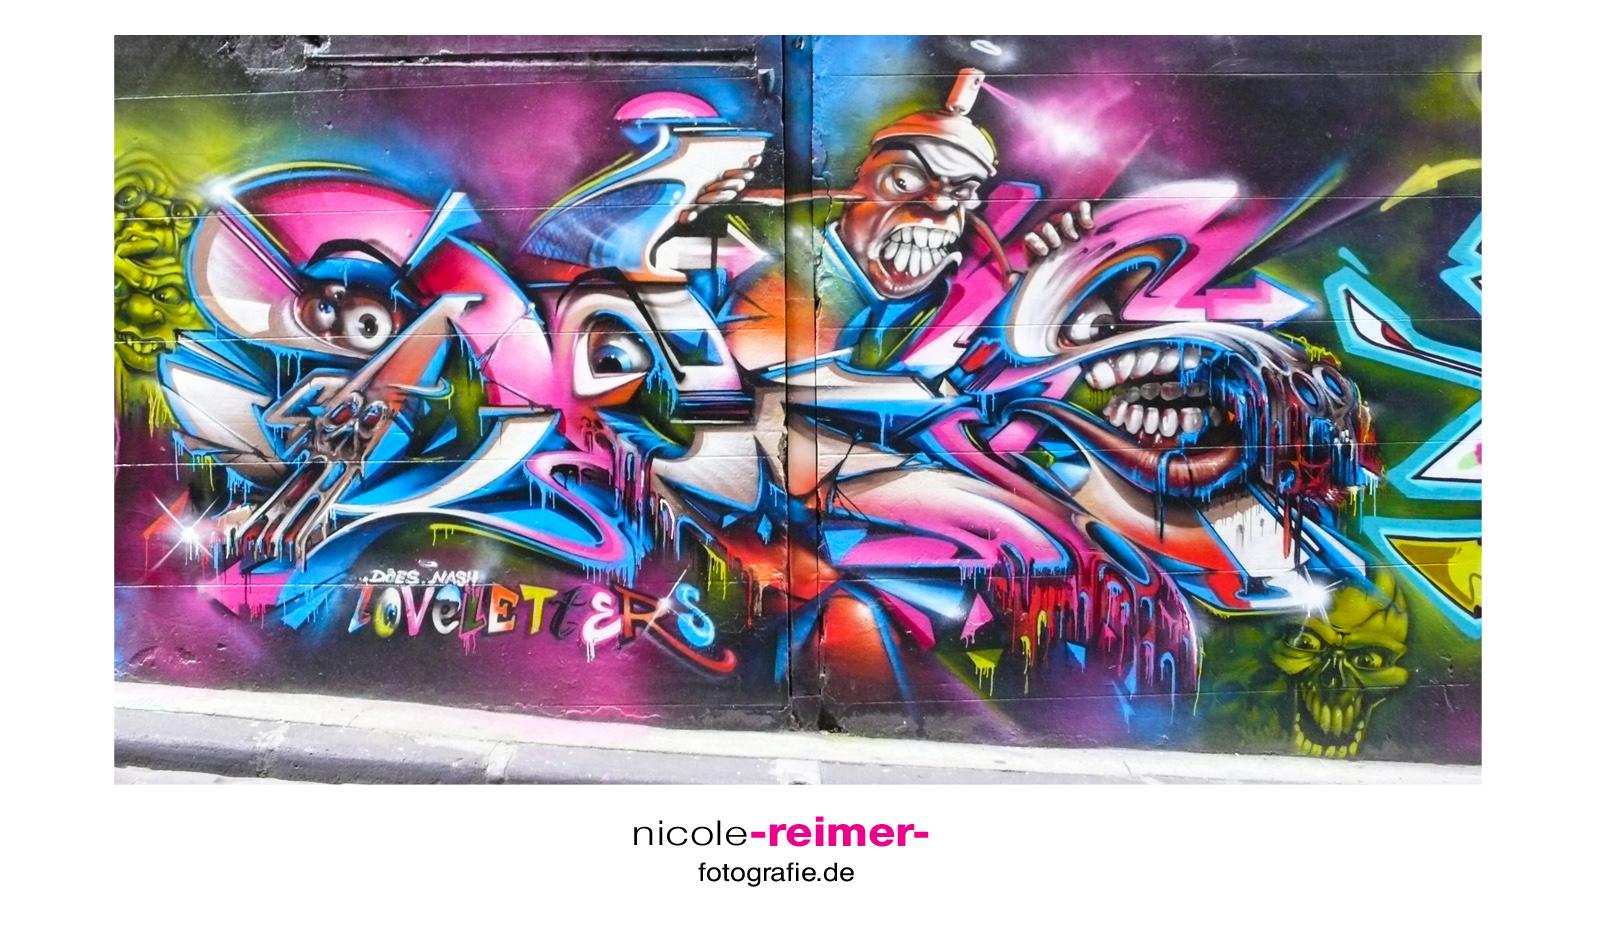 Nicole_Reimer_Fotografie_Street_Art_Melbourne_7